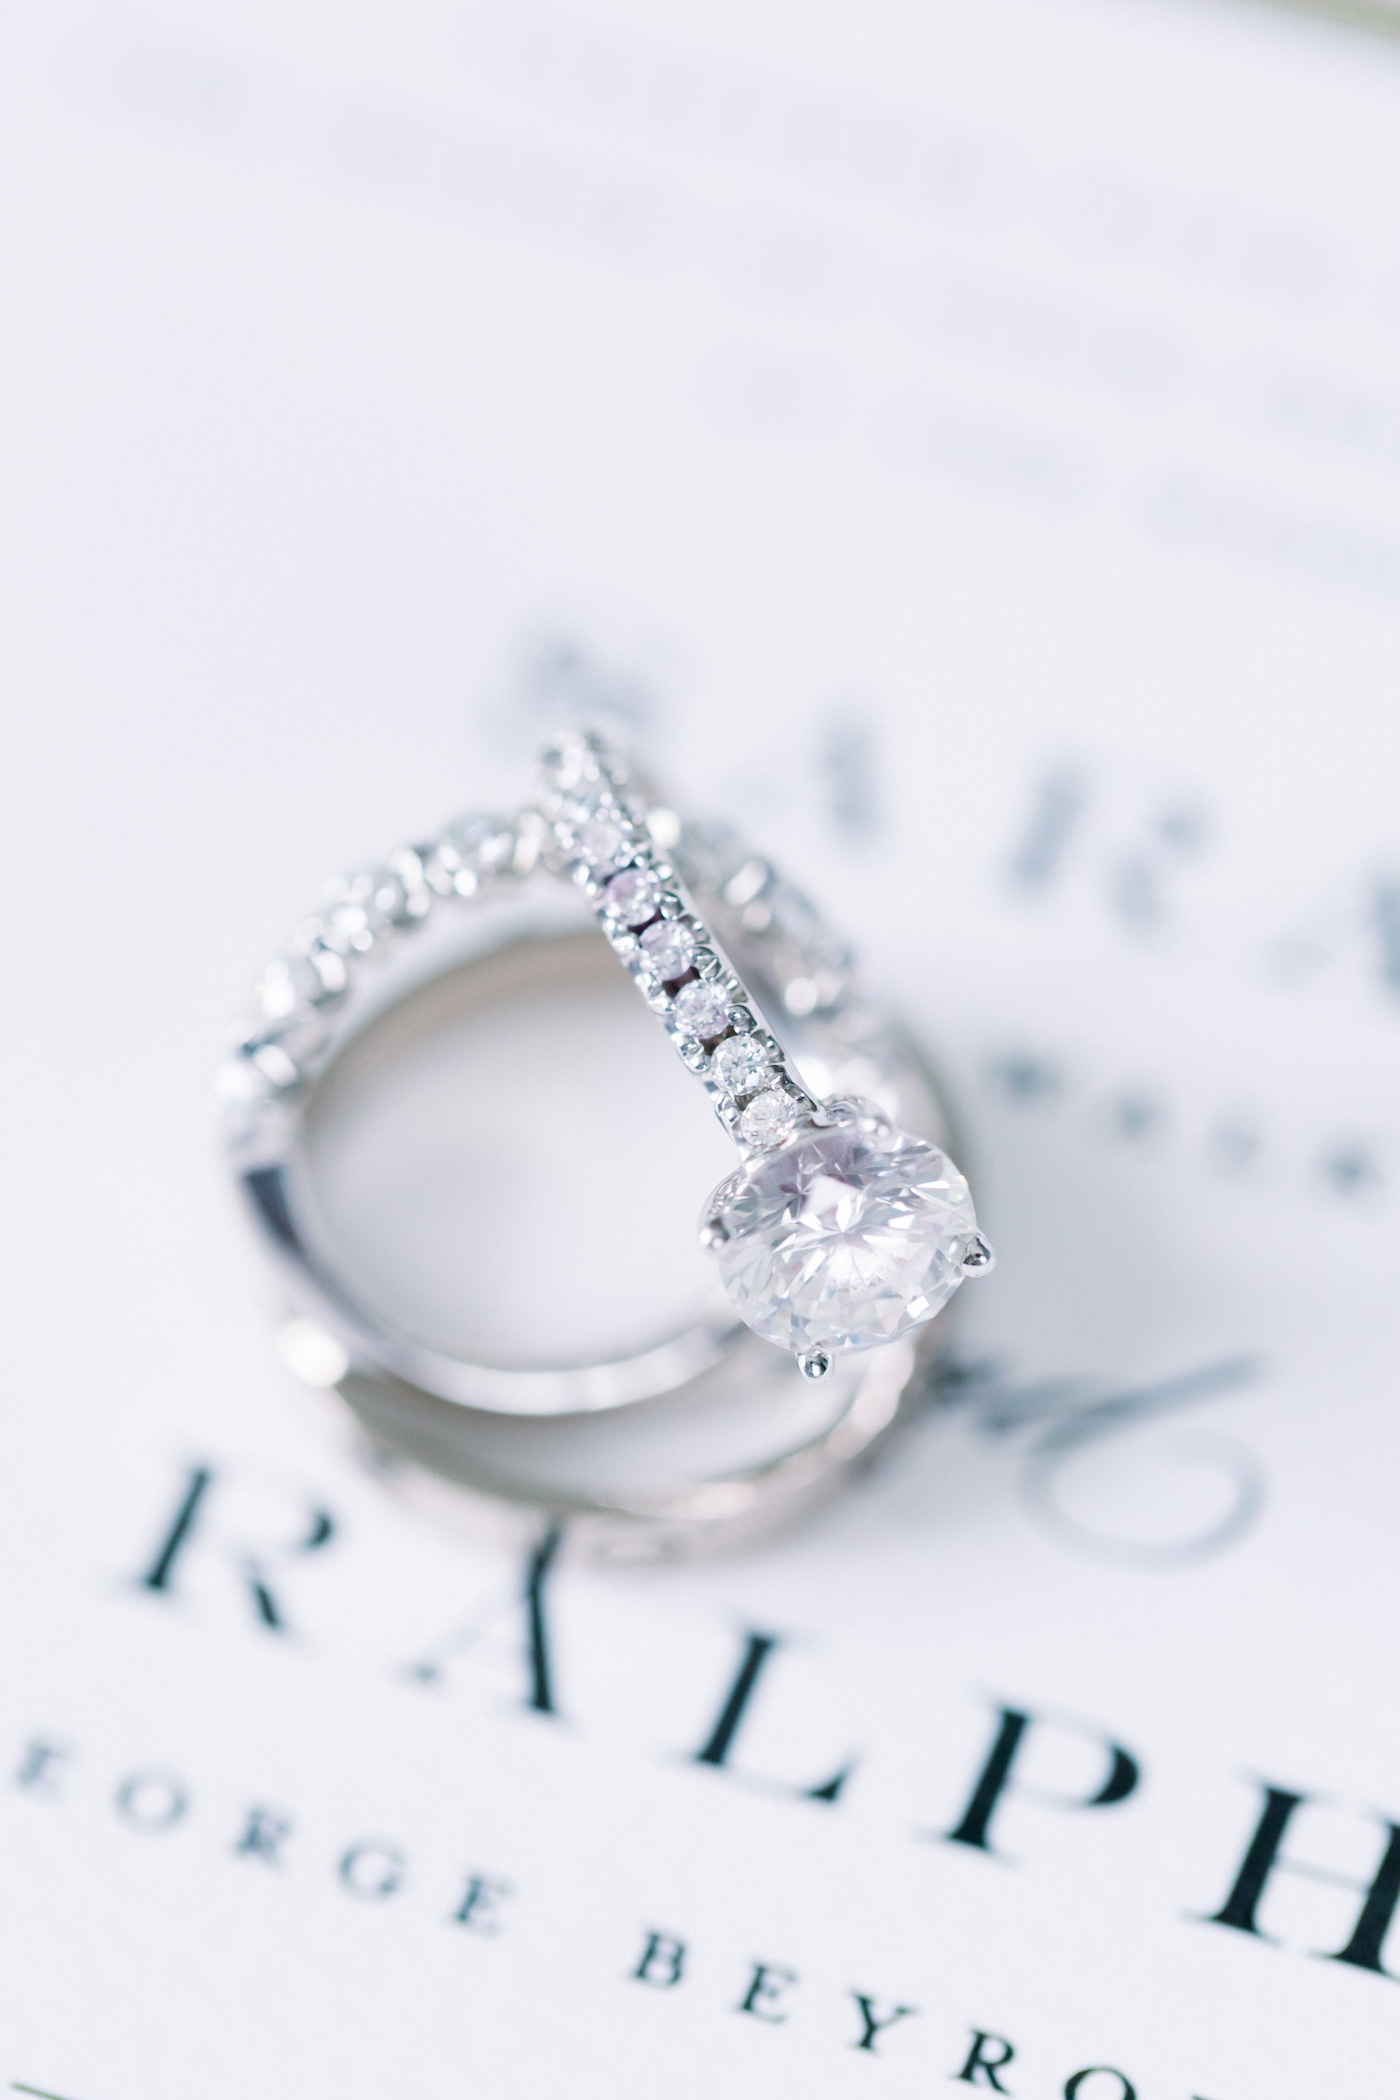 Round Solitaire Diamond Engagement Ring | Tampa Bay Wedding Photographer Shauna and Jordon Photography